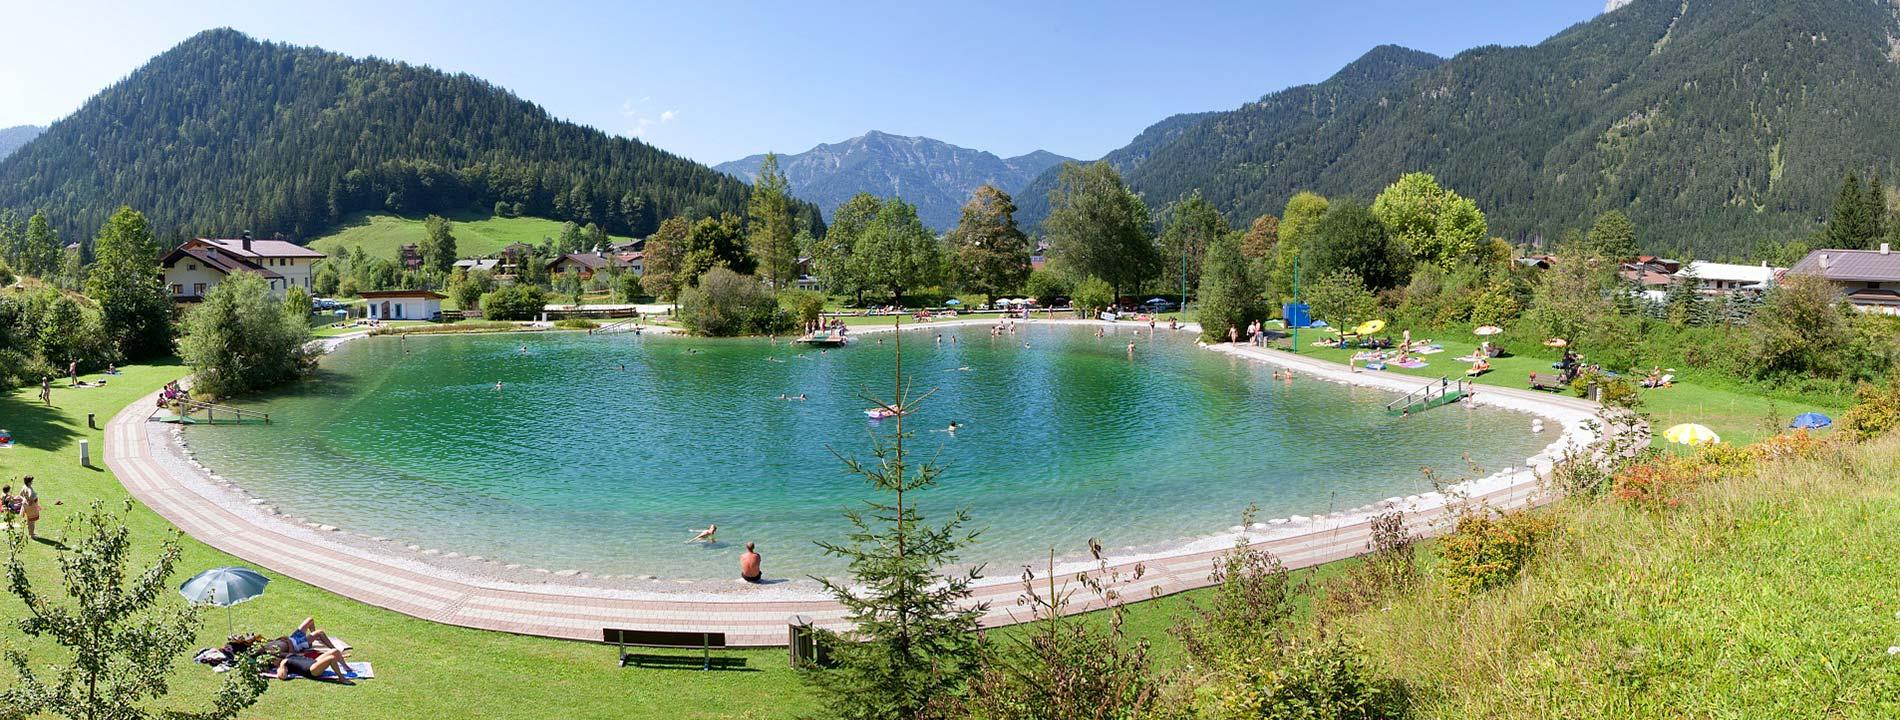 Angerhusl - Waidring - in den Kitzbheler Alpen